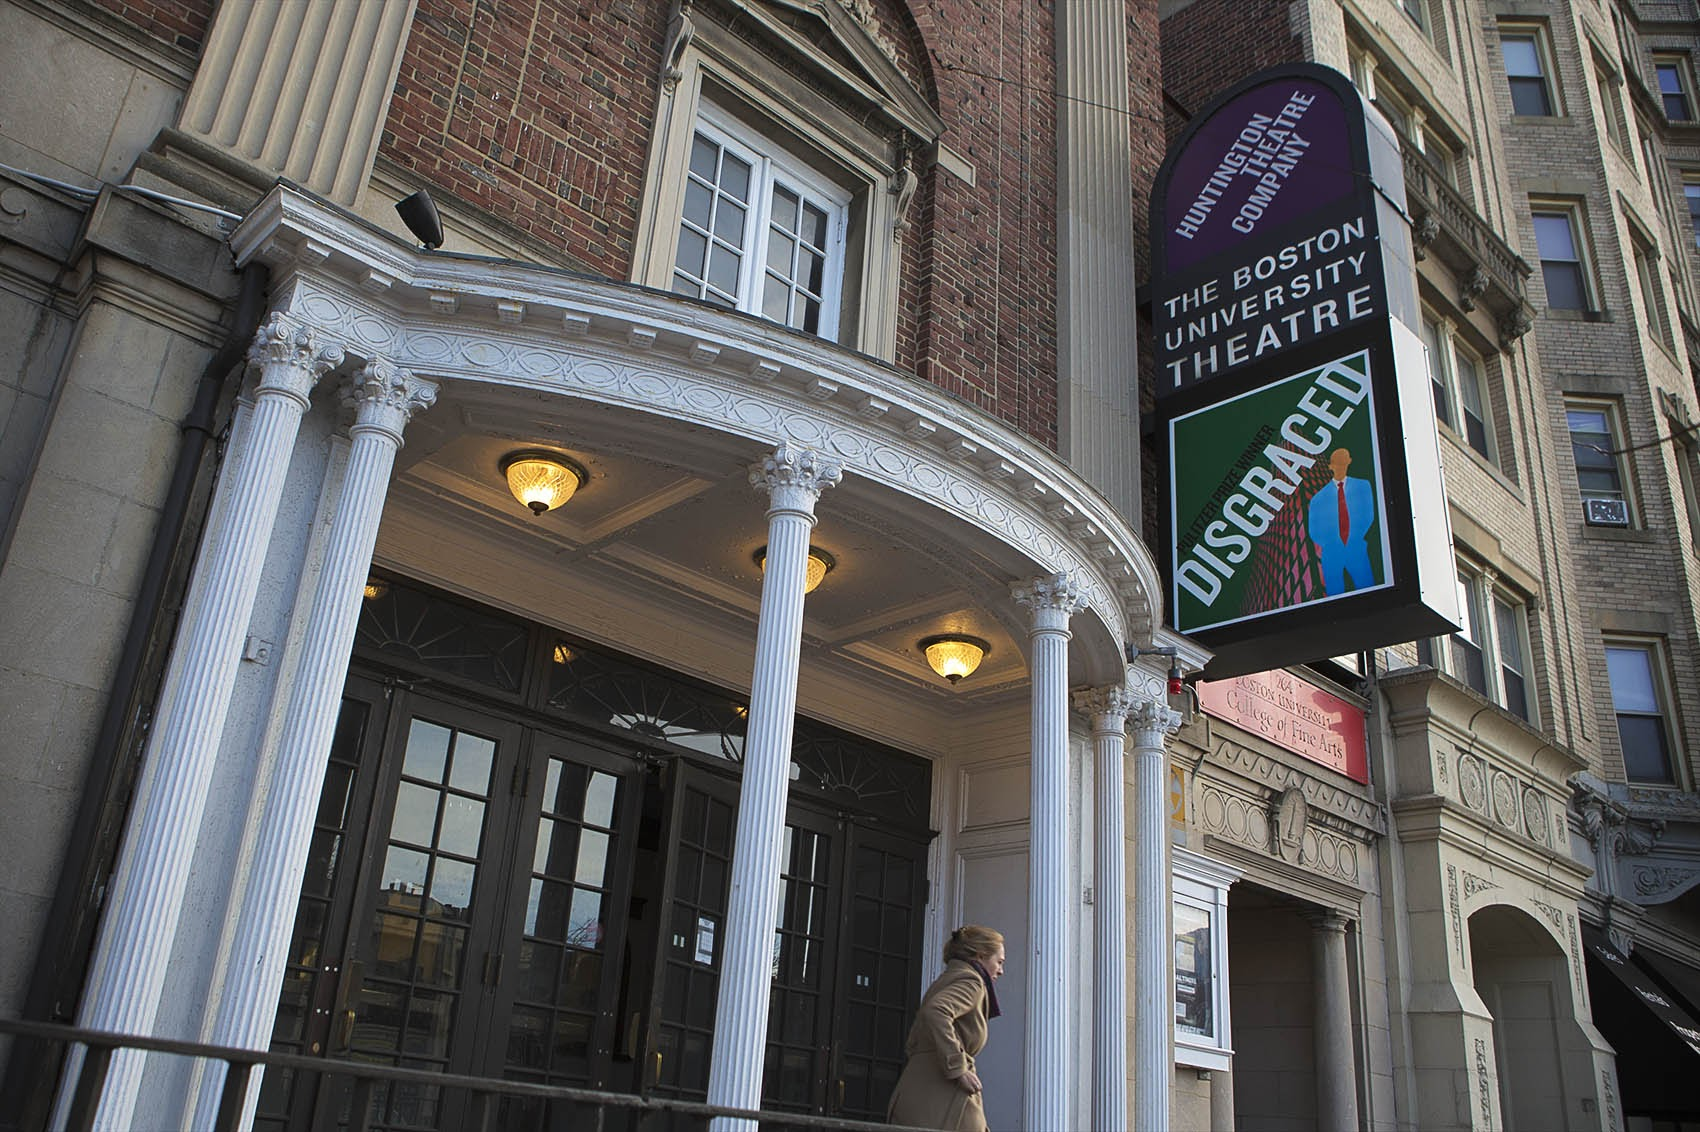 Huntington Theater Company on Huntington Avenue in Boston. (Jesse Costa/WBUR)